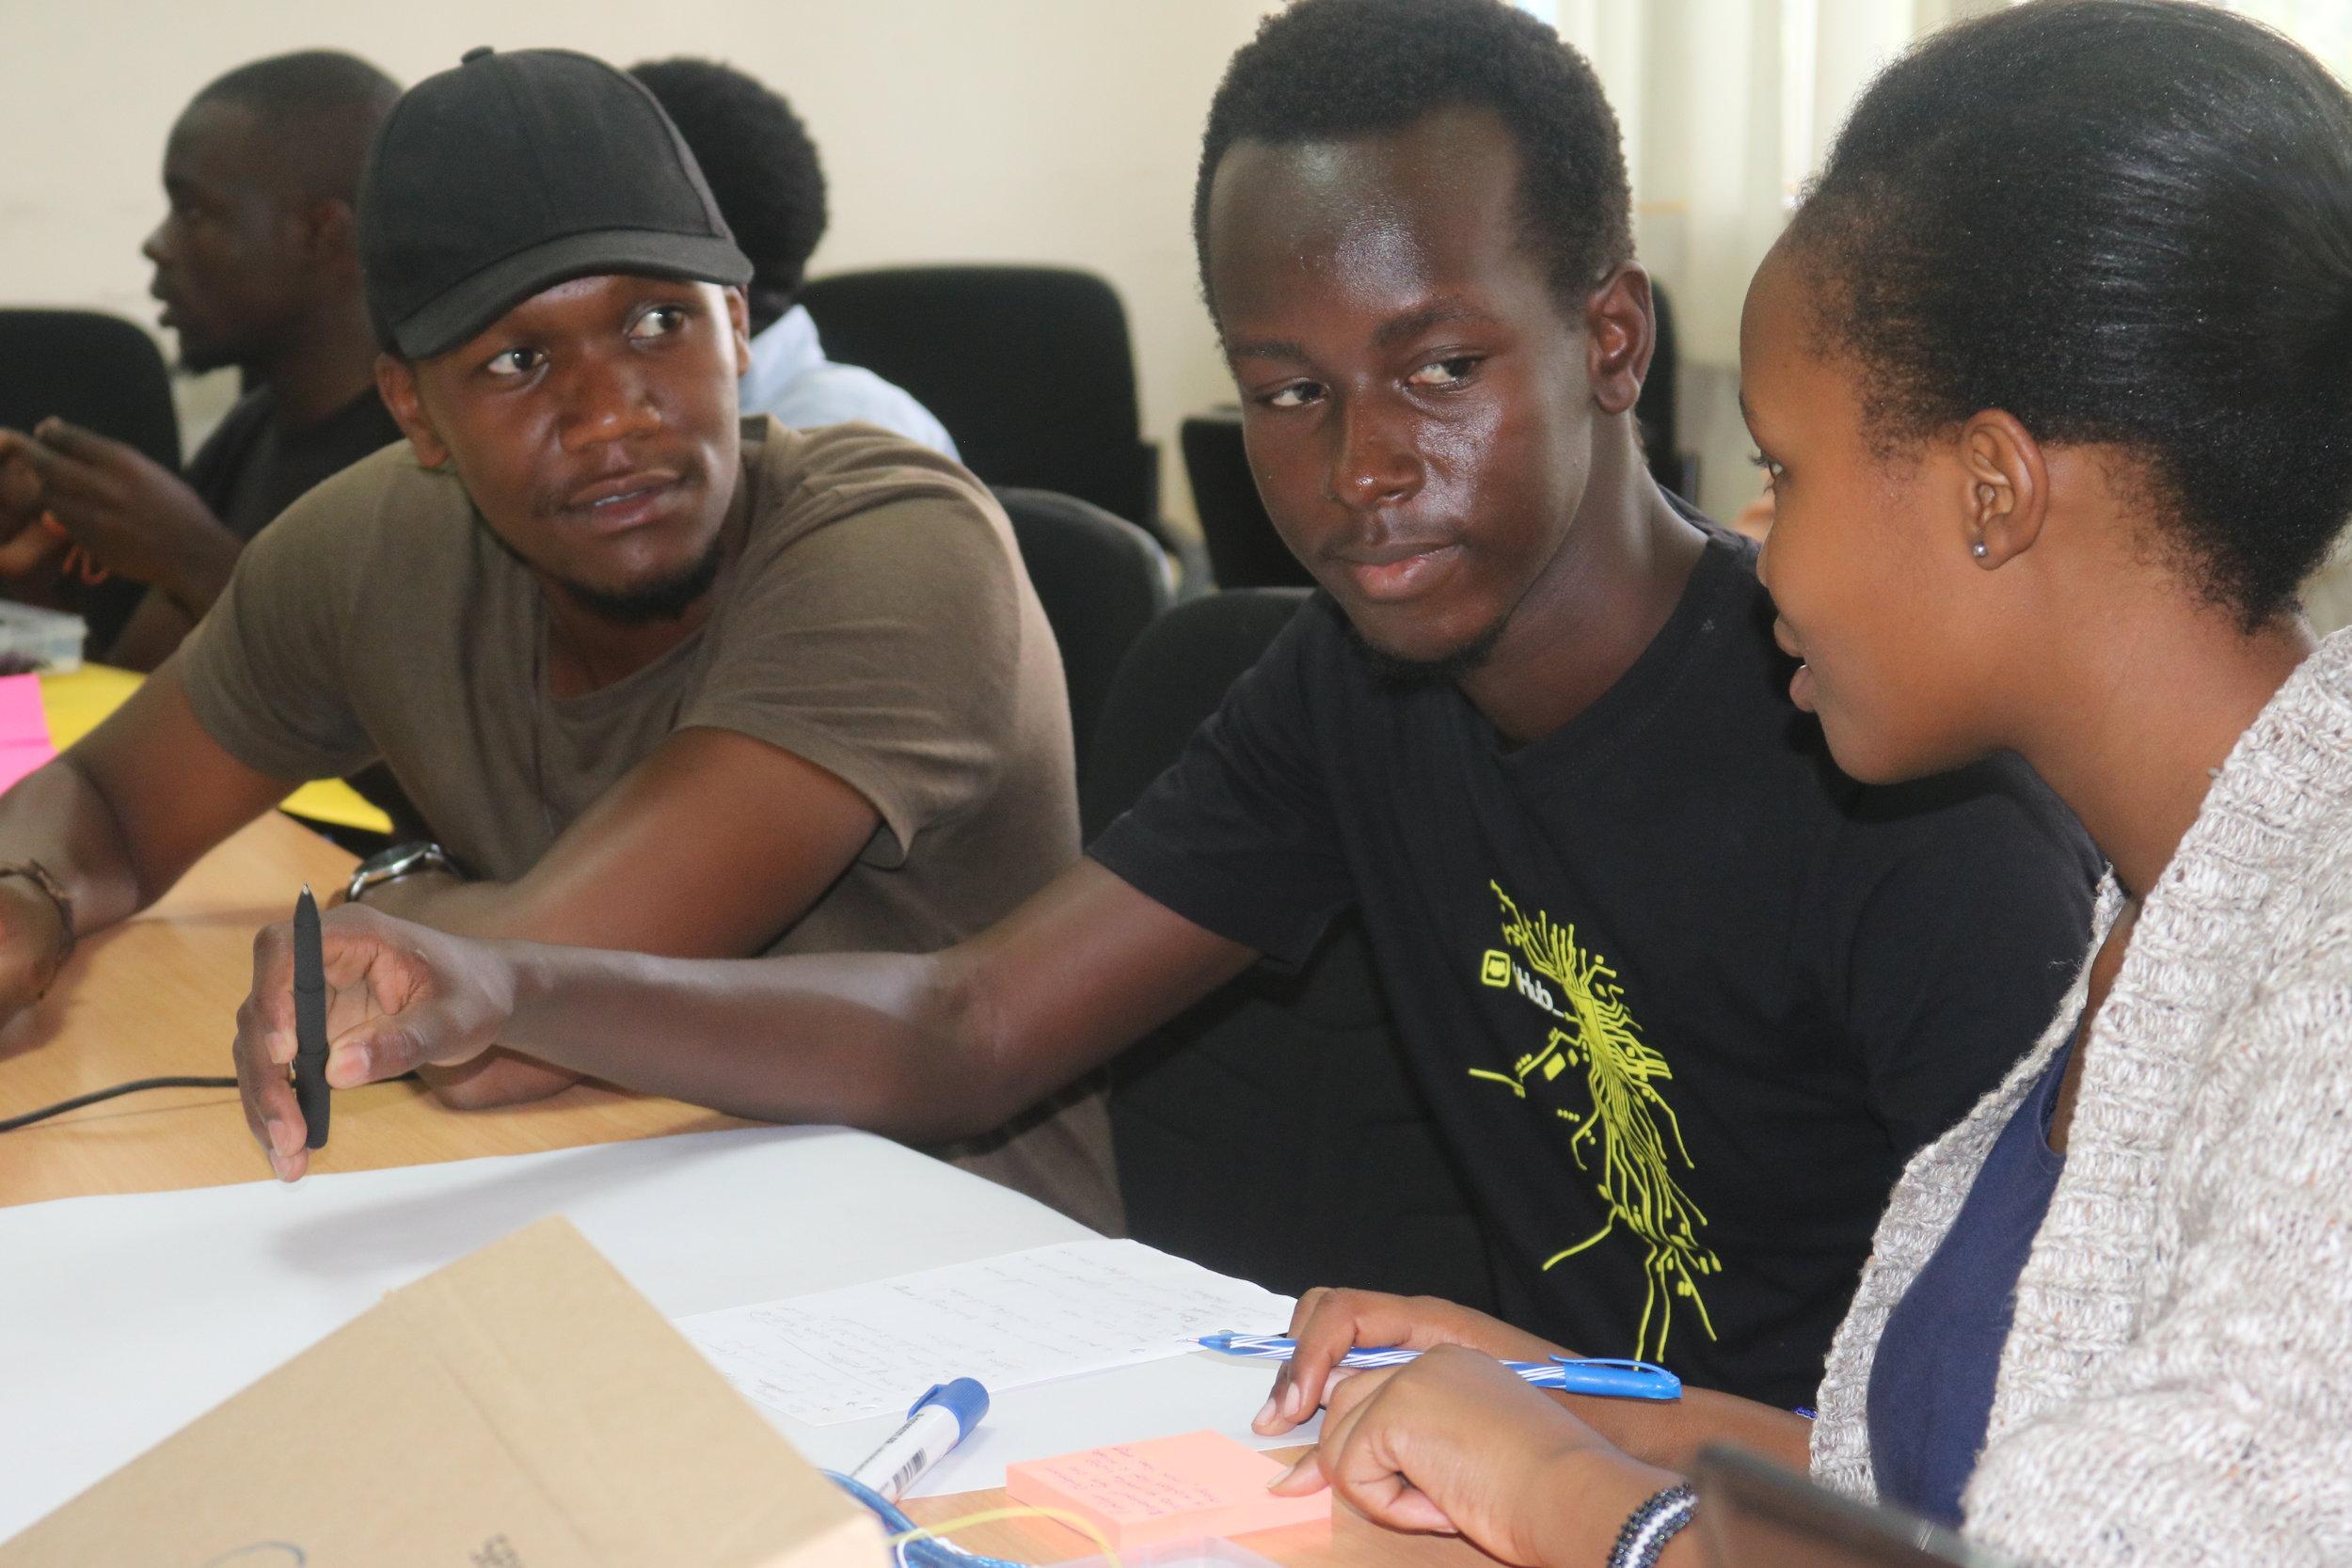 Students brainstorming